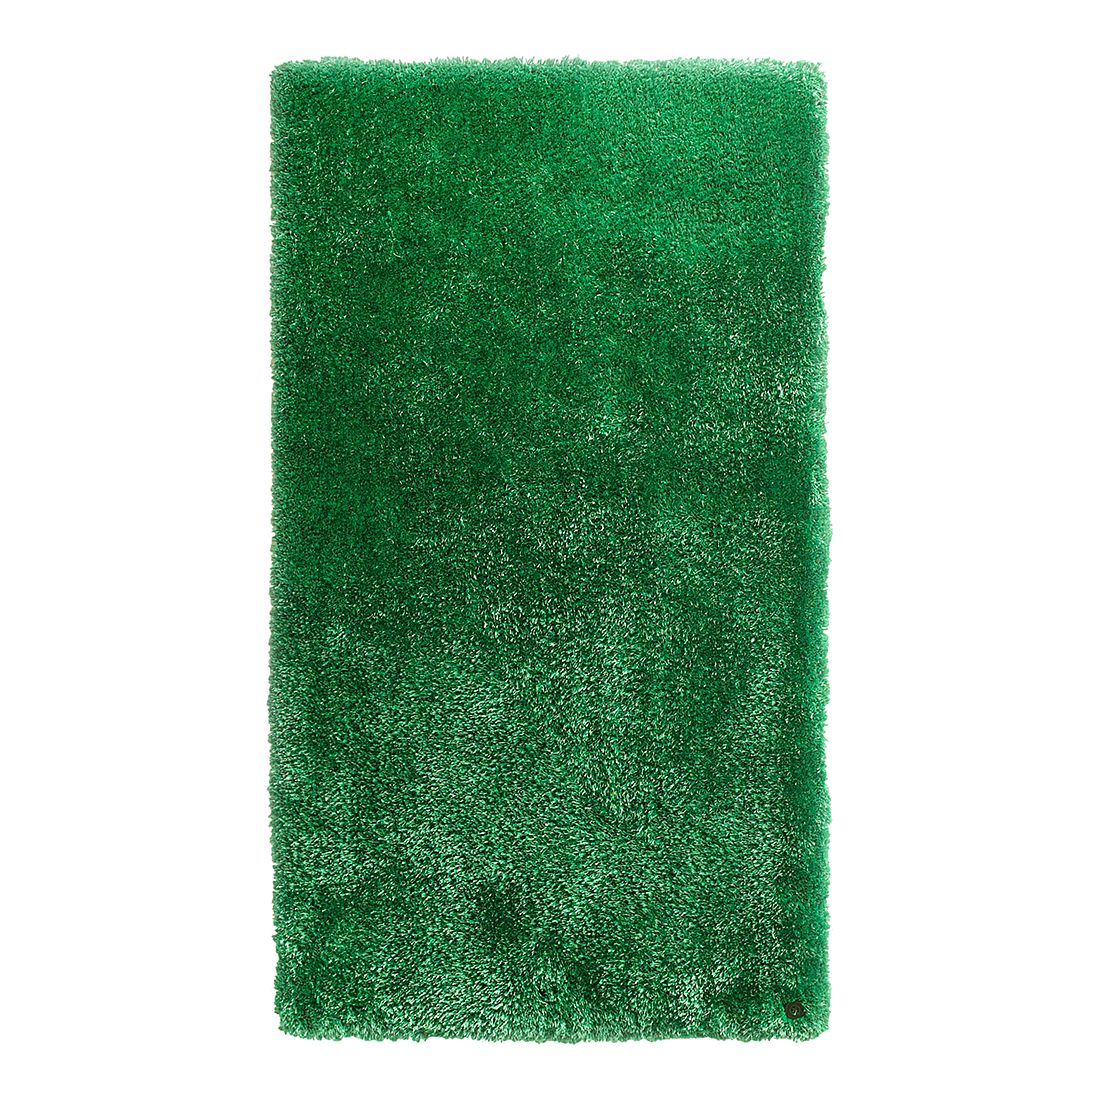 Tapijt Soft Square - groen -maat: 85x155cm, Tom Tailor